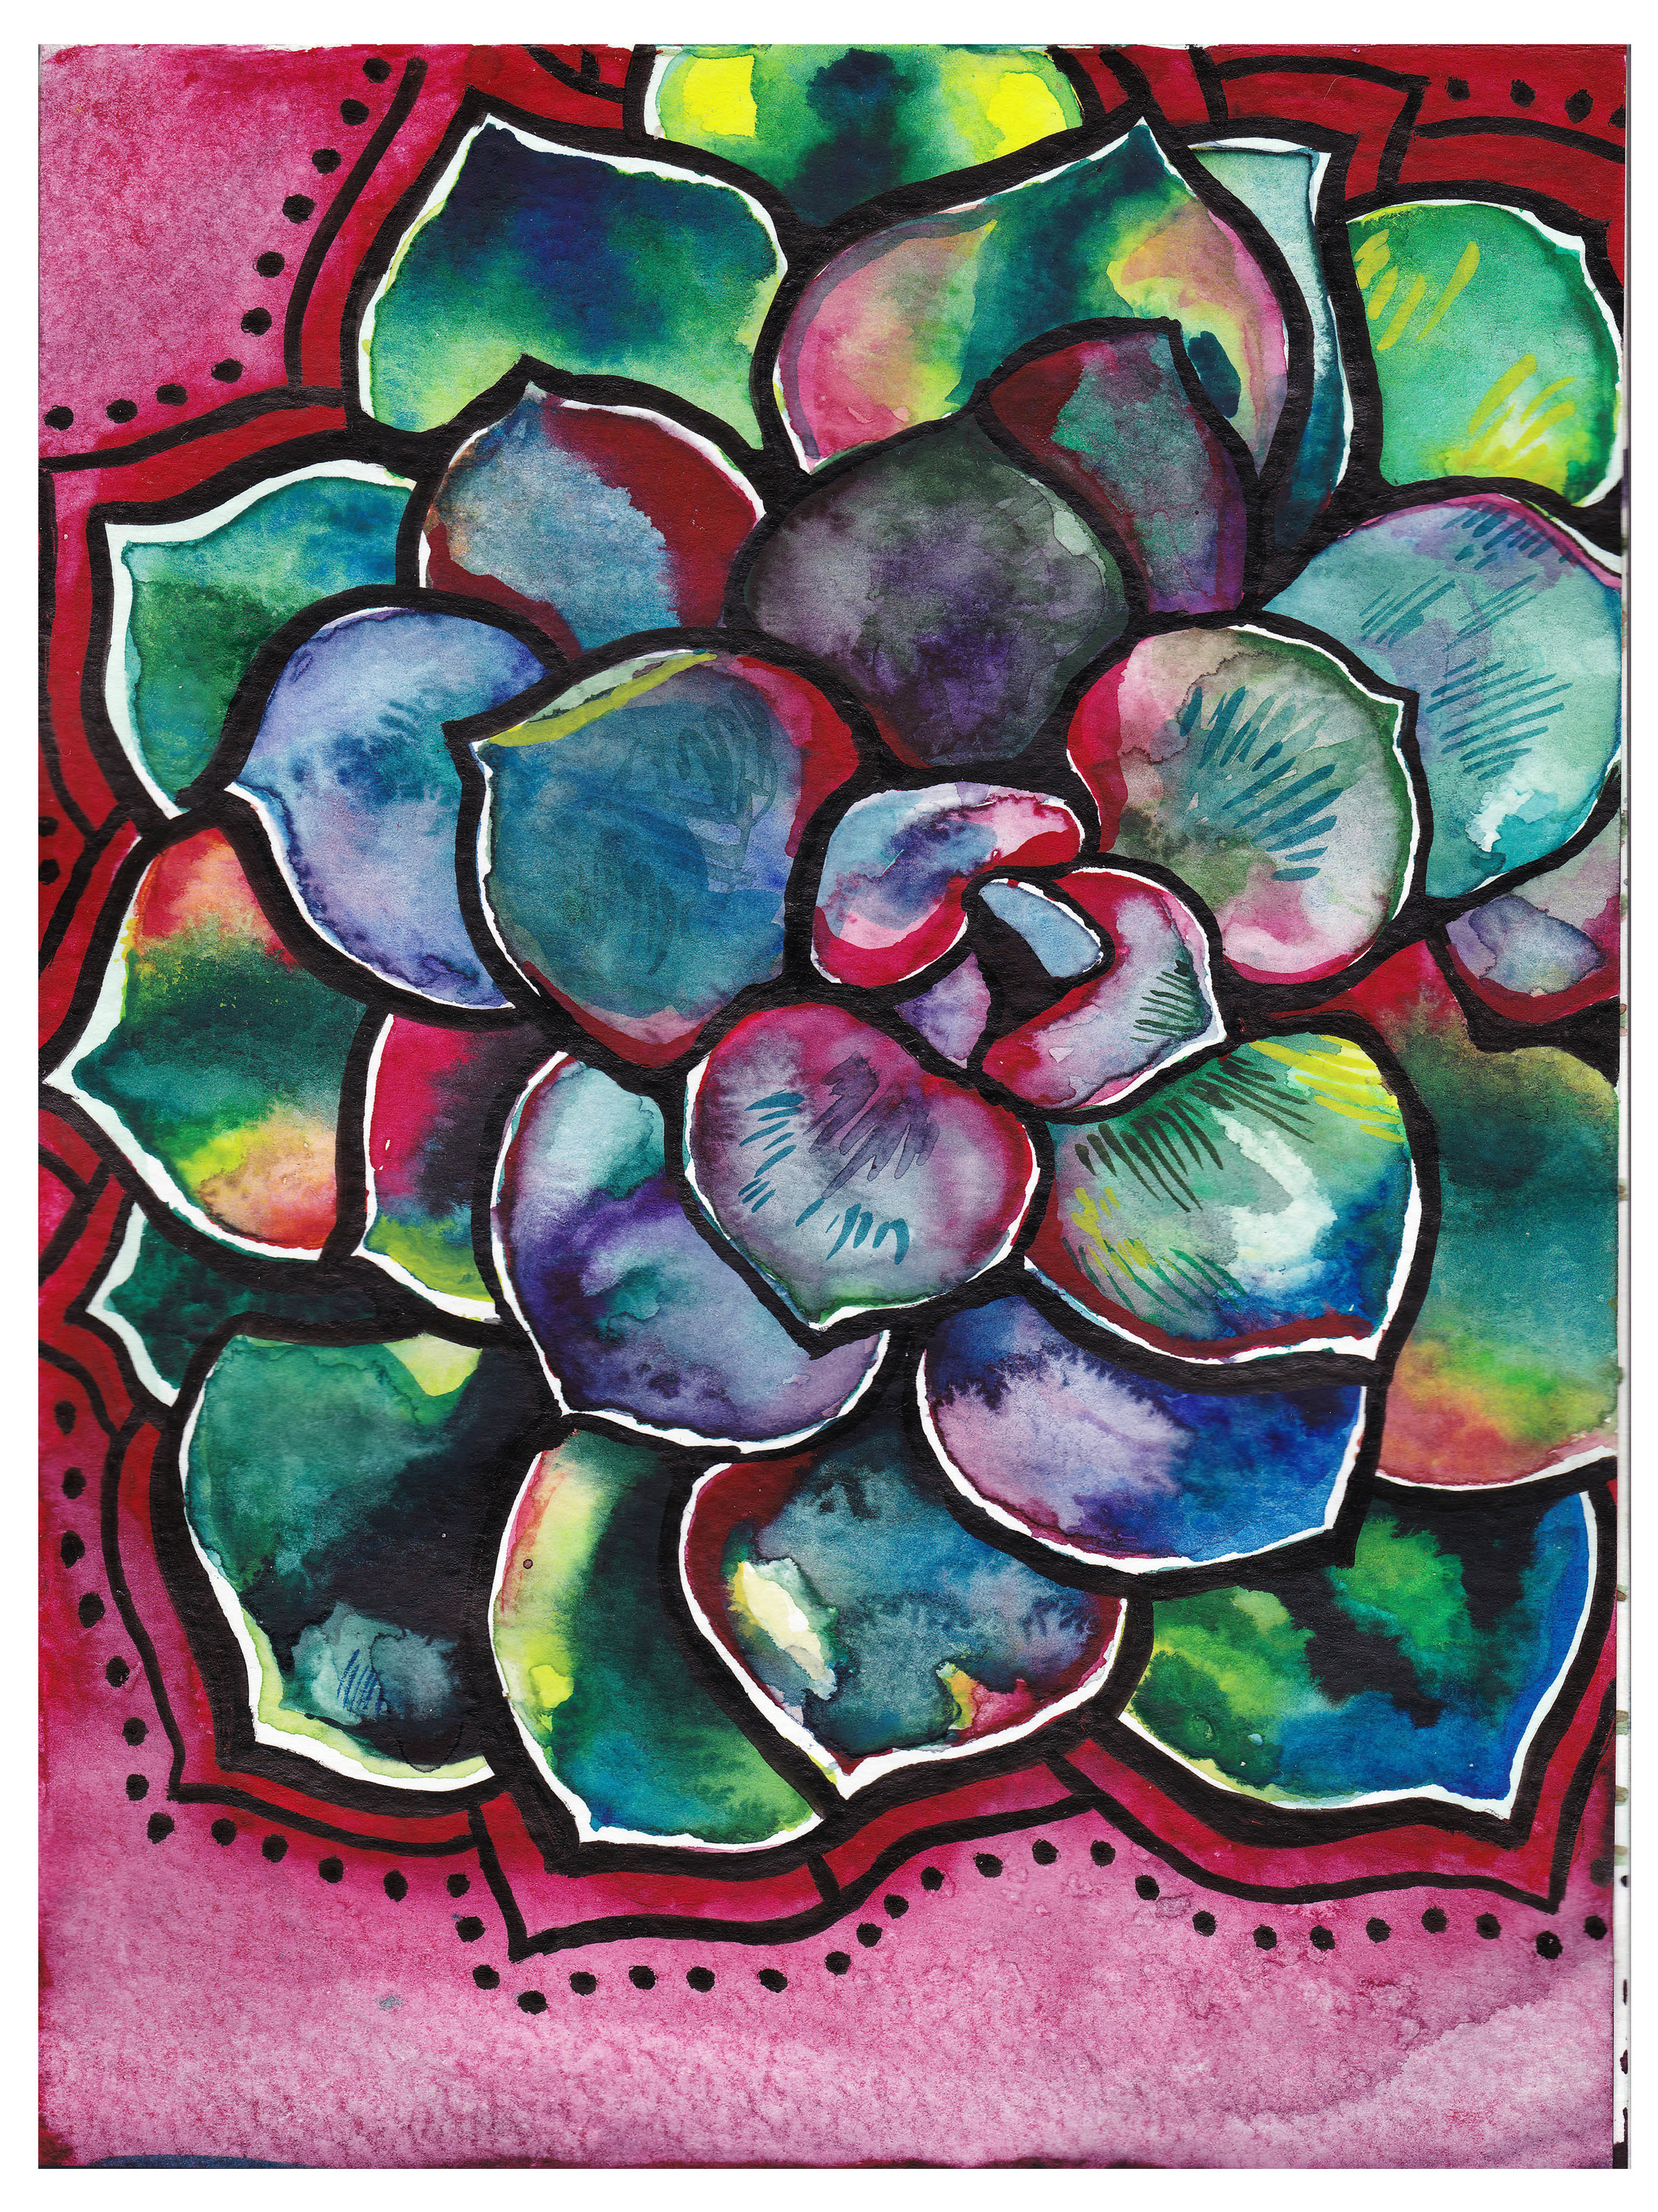 succulenta watercolor and ink 5x7 2016